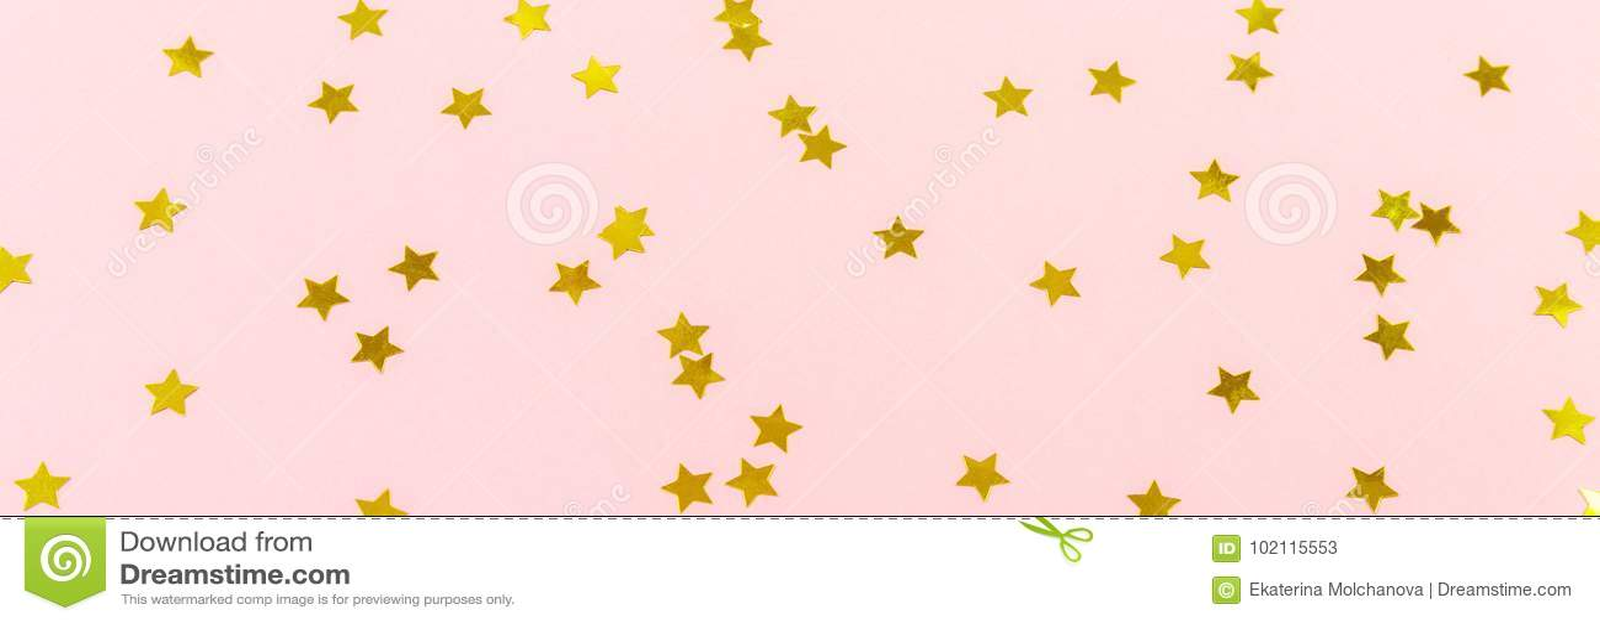 Golden star sprinkles on pink. Festive holiday background. Celeb